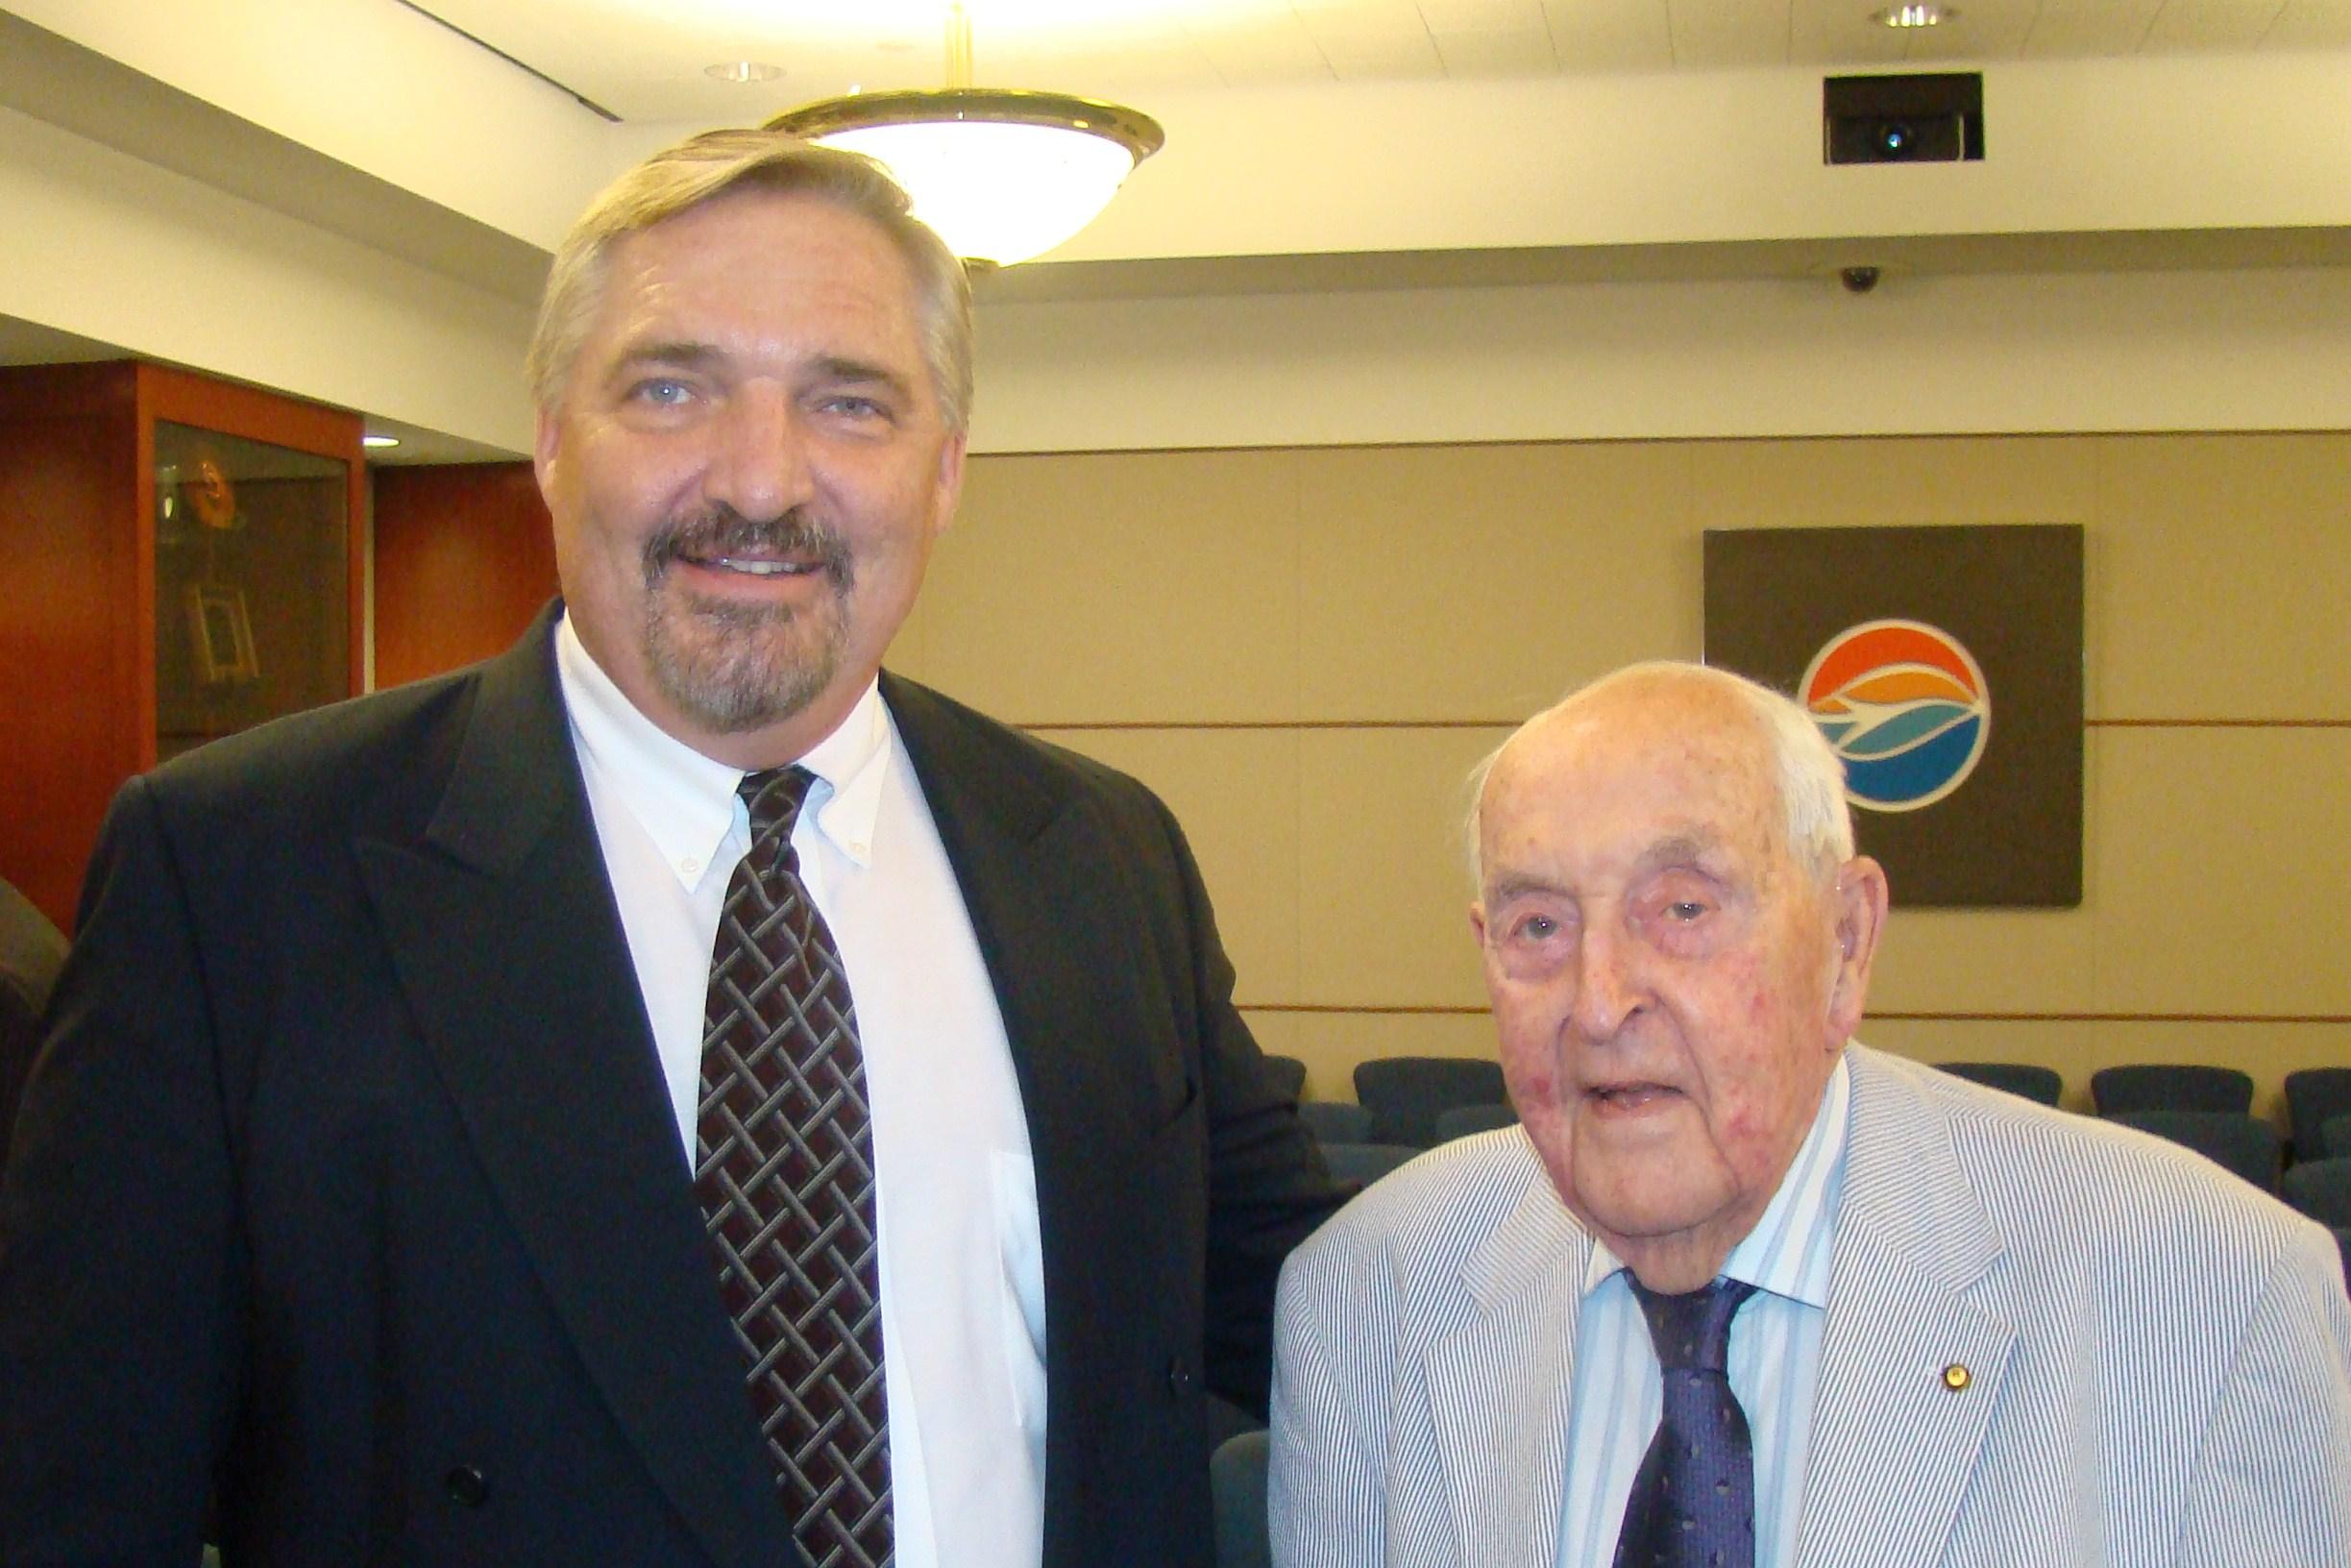 John Dahl & Sir Lenox, 27 Oct '11.JPG